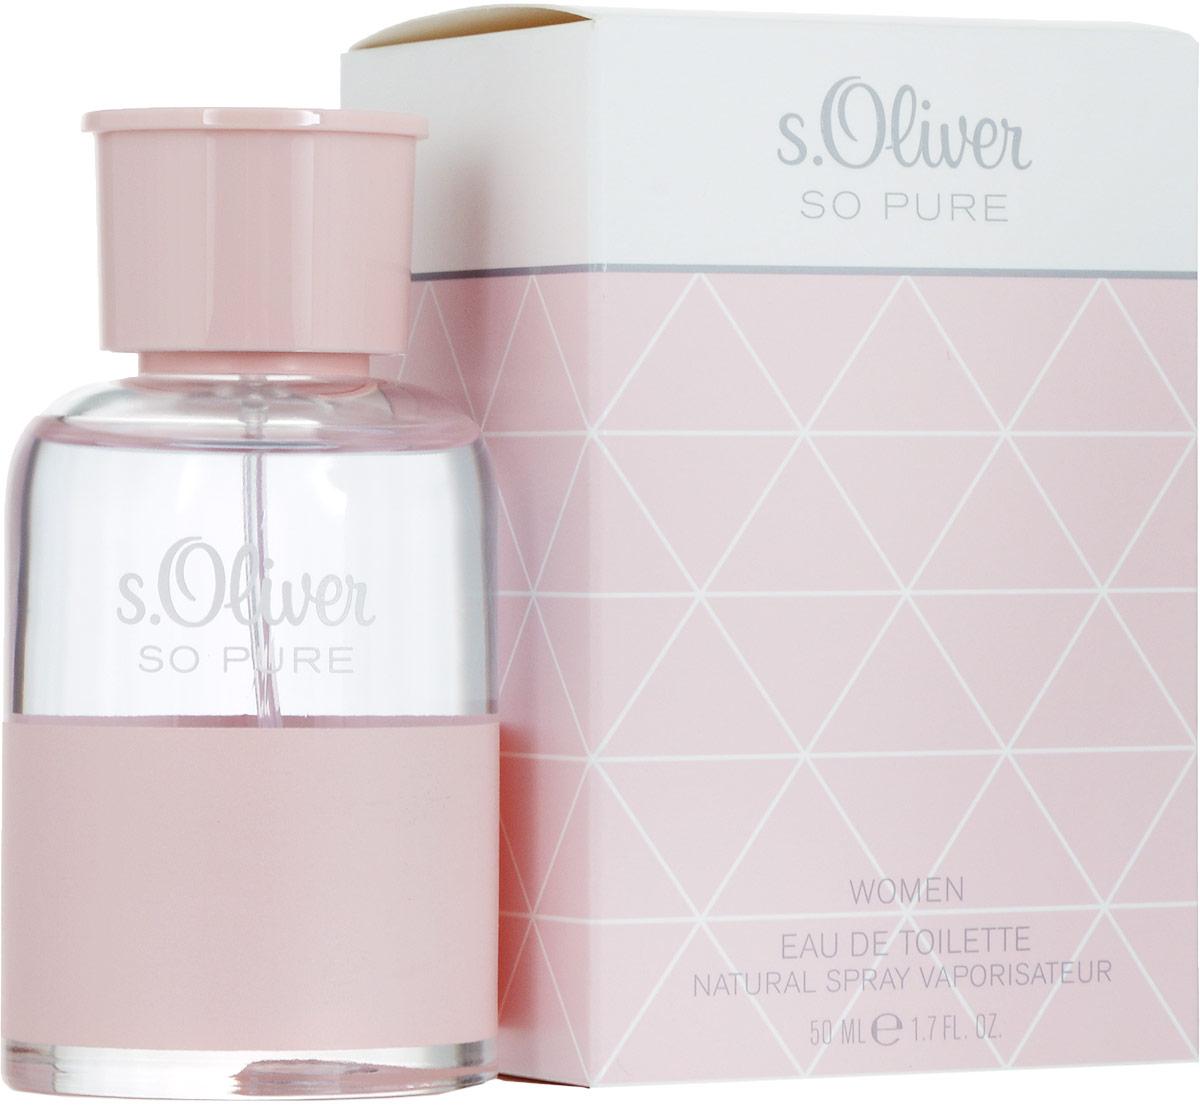 S.oliver So Pure Туалетная вода женская, 50 мл